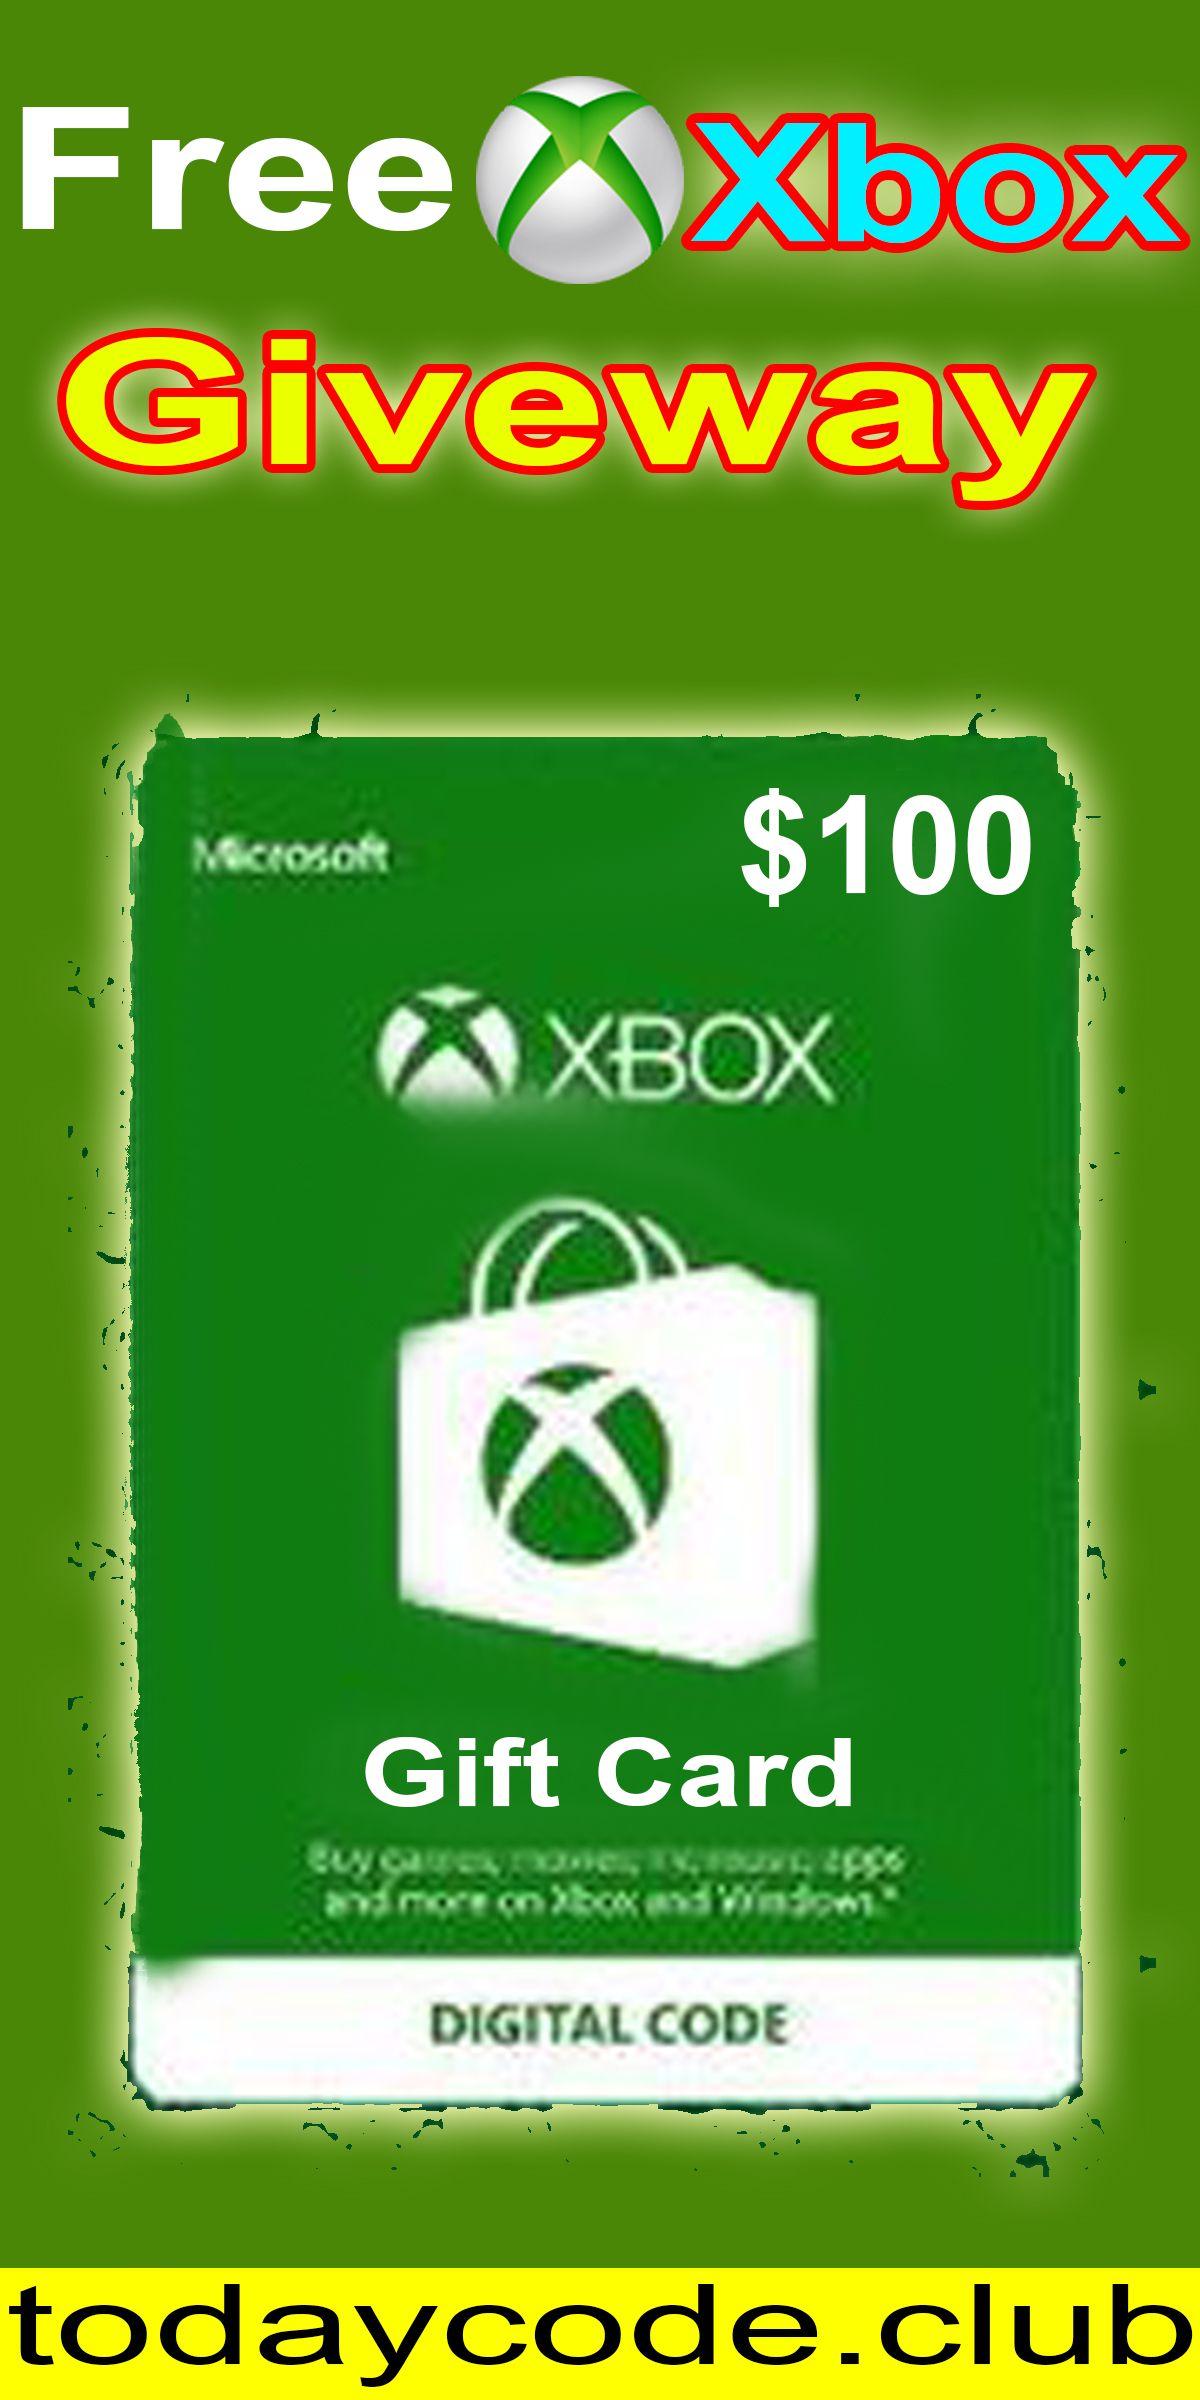 Xbox redeem code generator free Xbox gift card codes